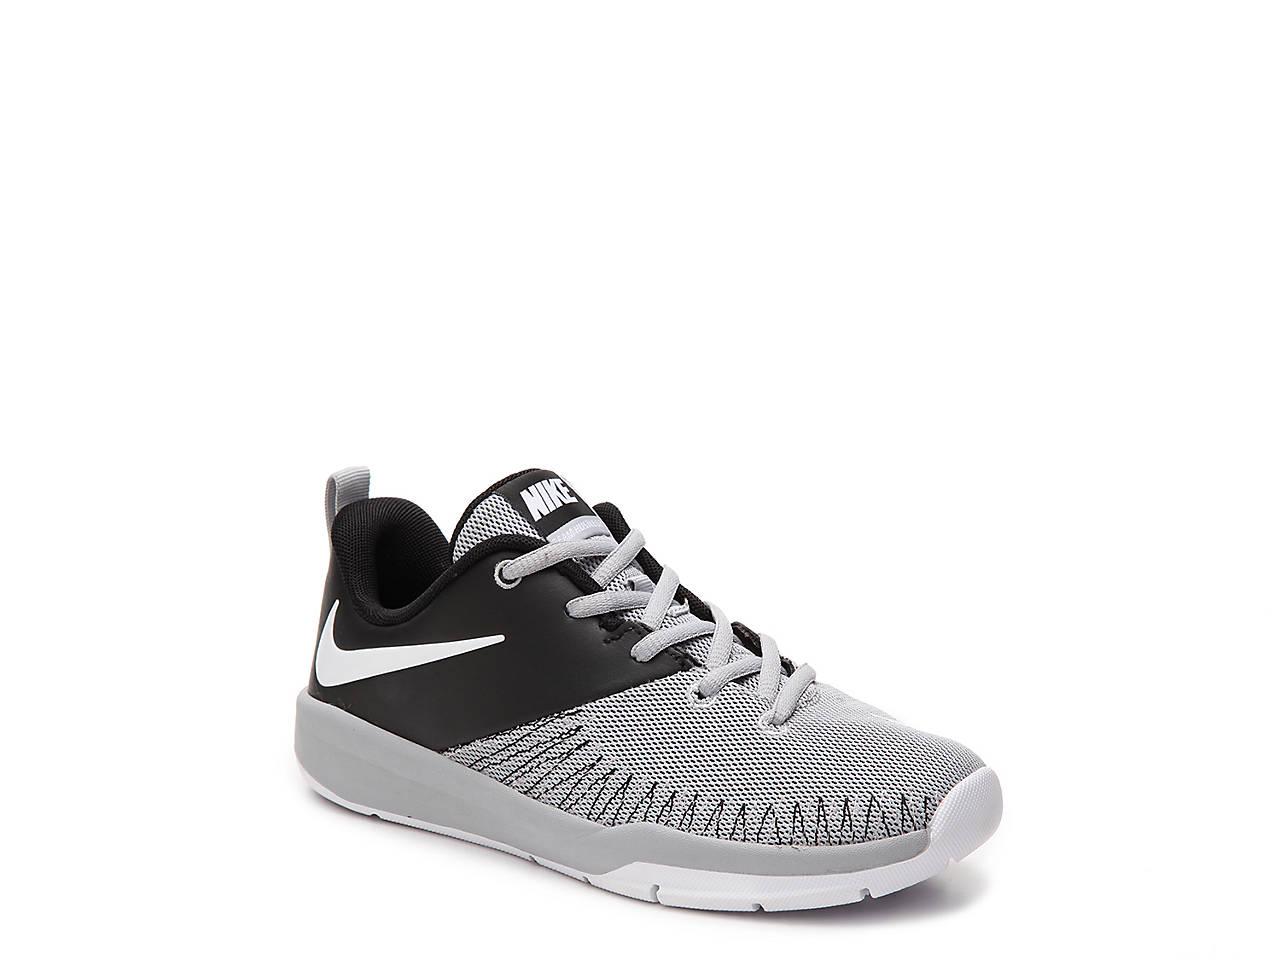 4034f25fd698 Nike Team Hustle D7 Low Youth Basketball Shoe Kids Shoes